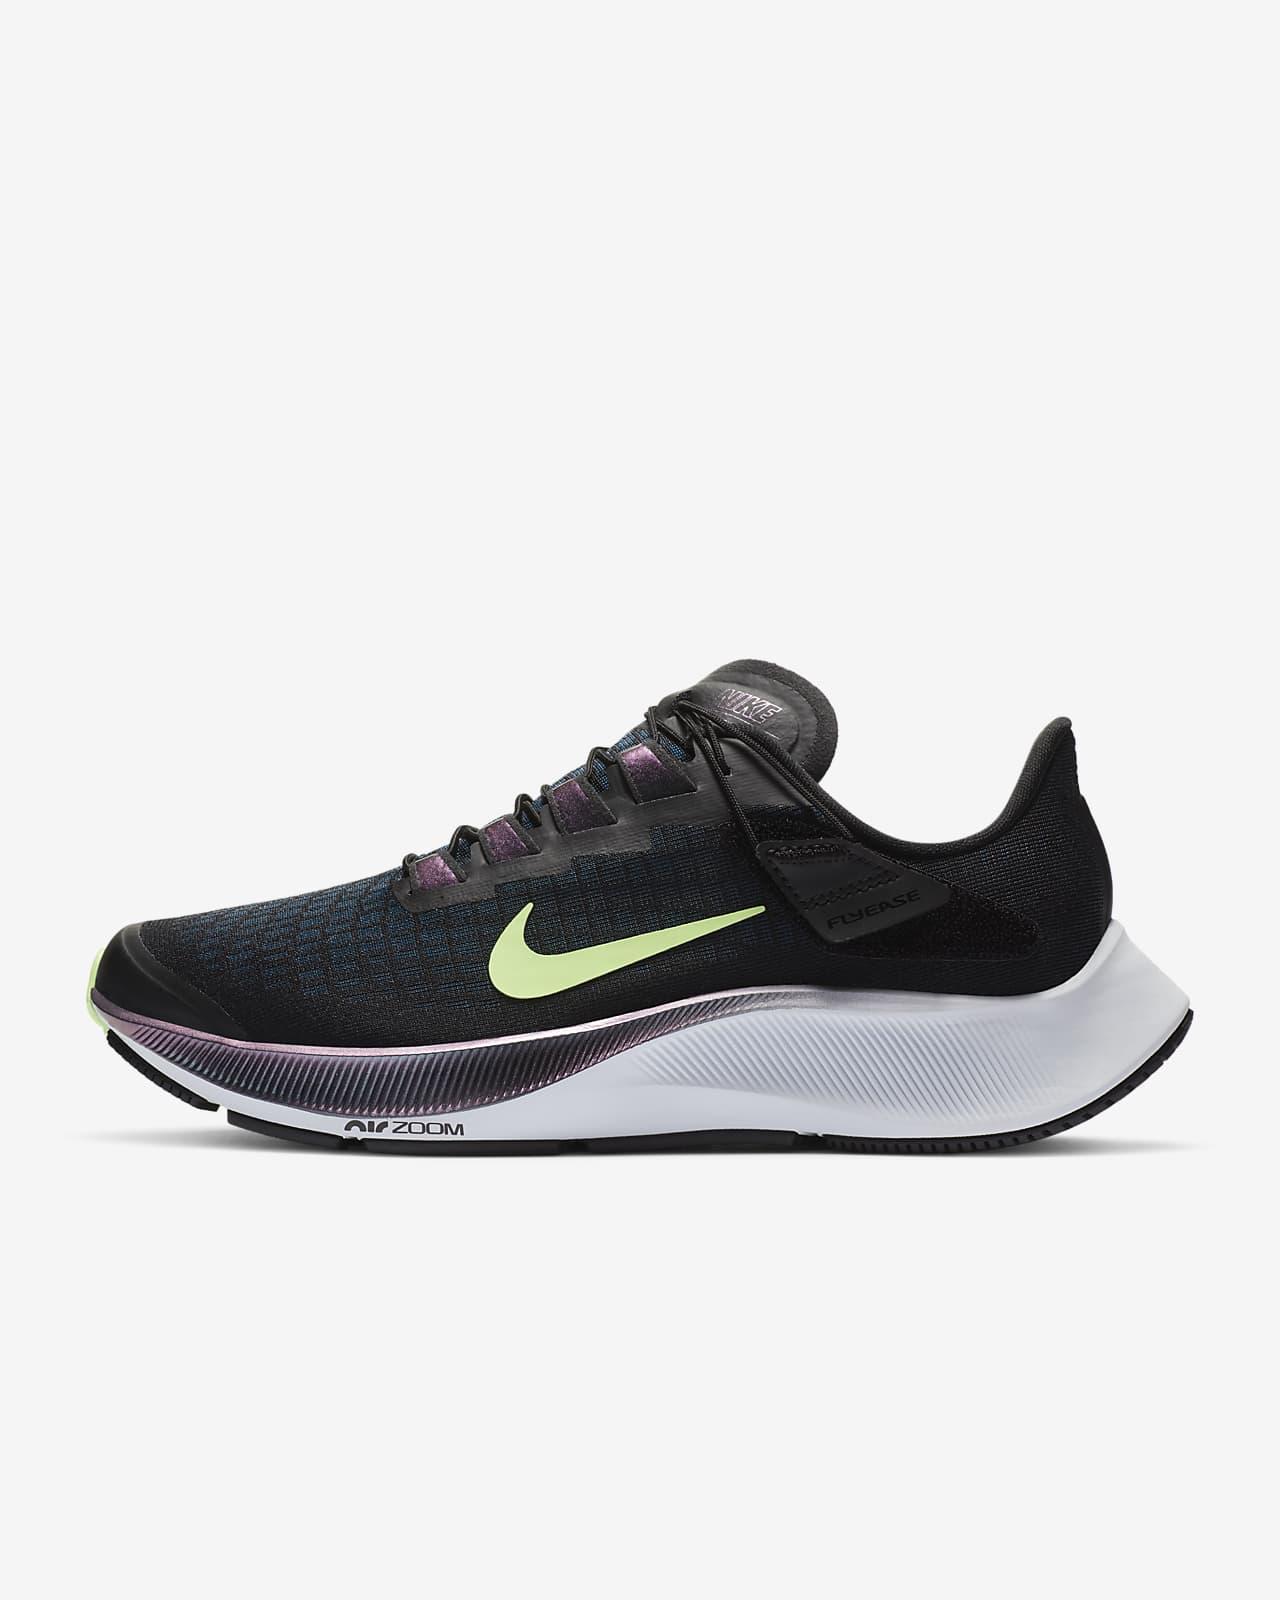 Chaussure de running Nike Air Zoom Pegasus 37 FlyEase pour Femme